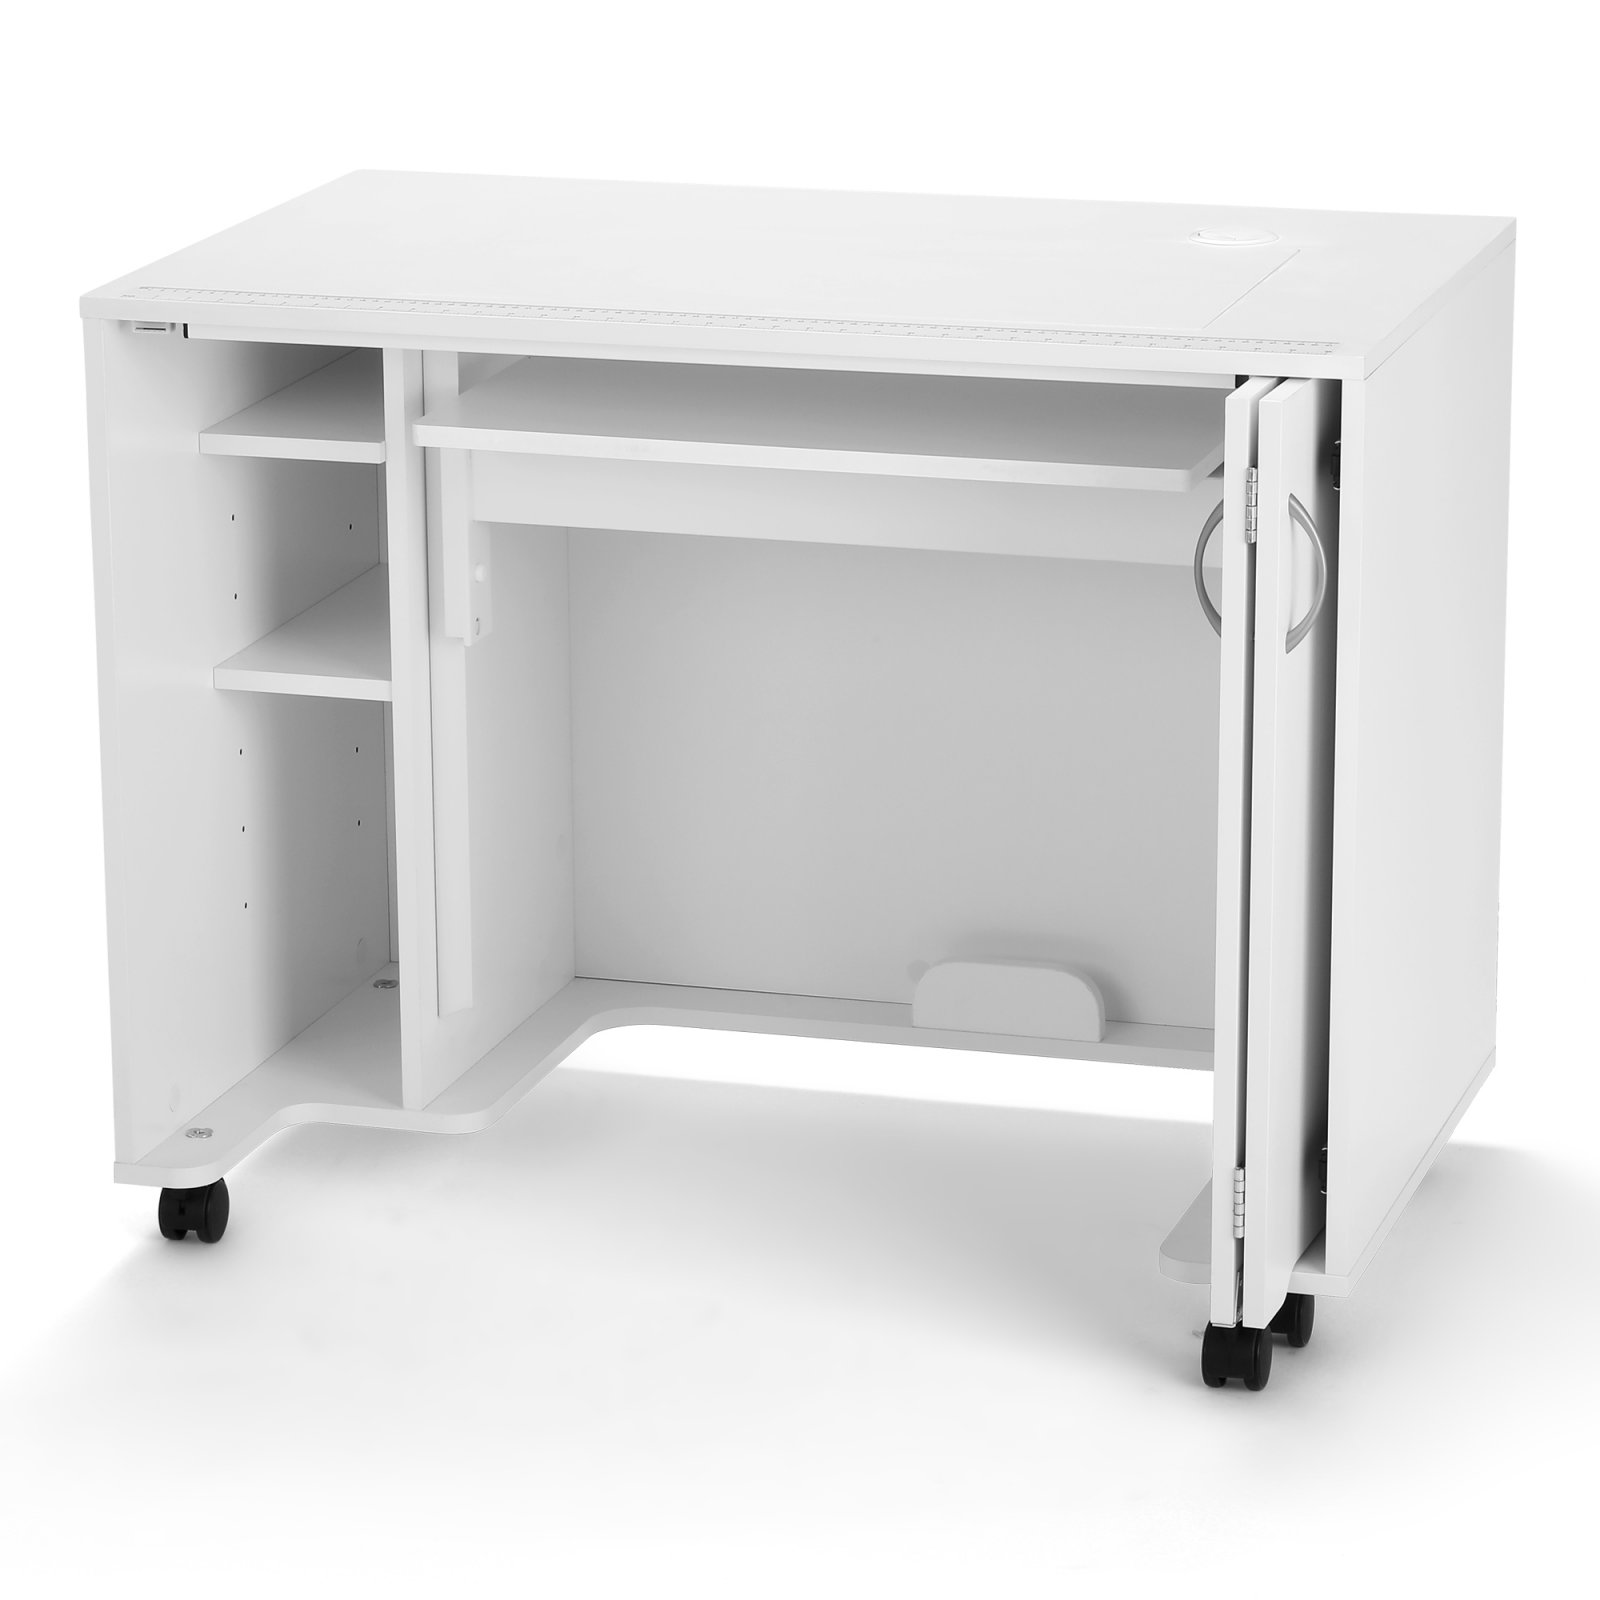 Kangaroo - Modular Sewing Cabinet w/Hydraulic Lift and Module Storage